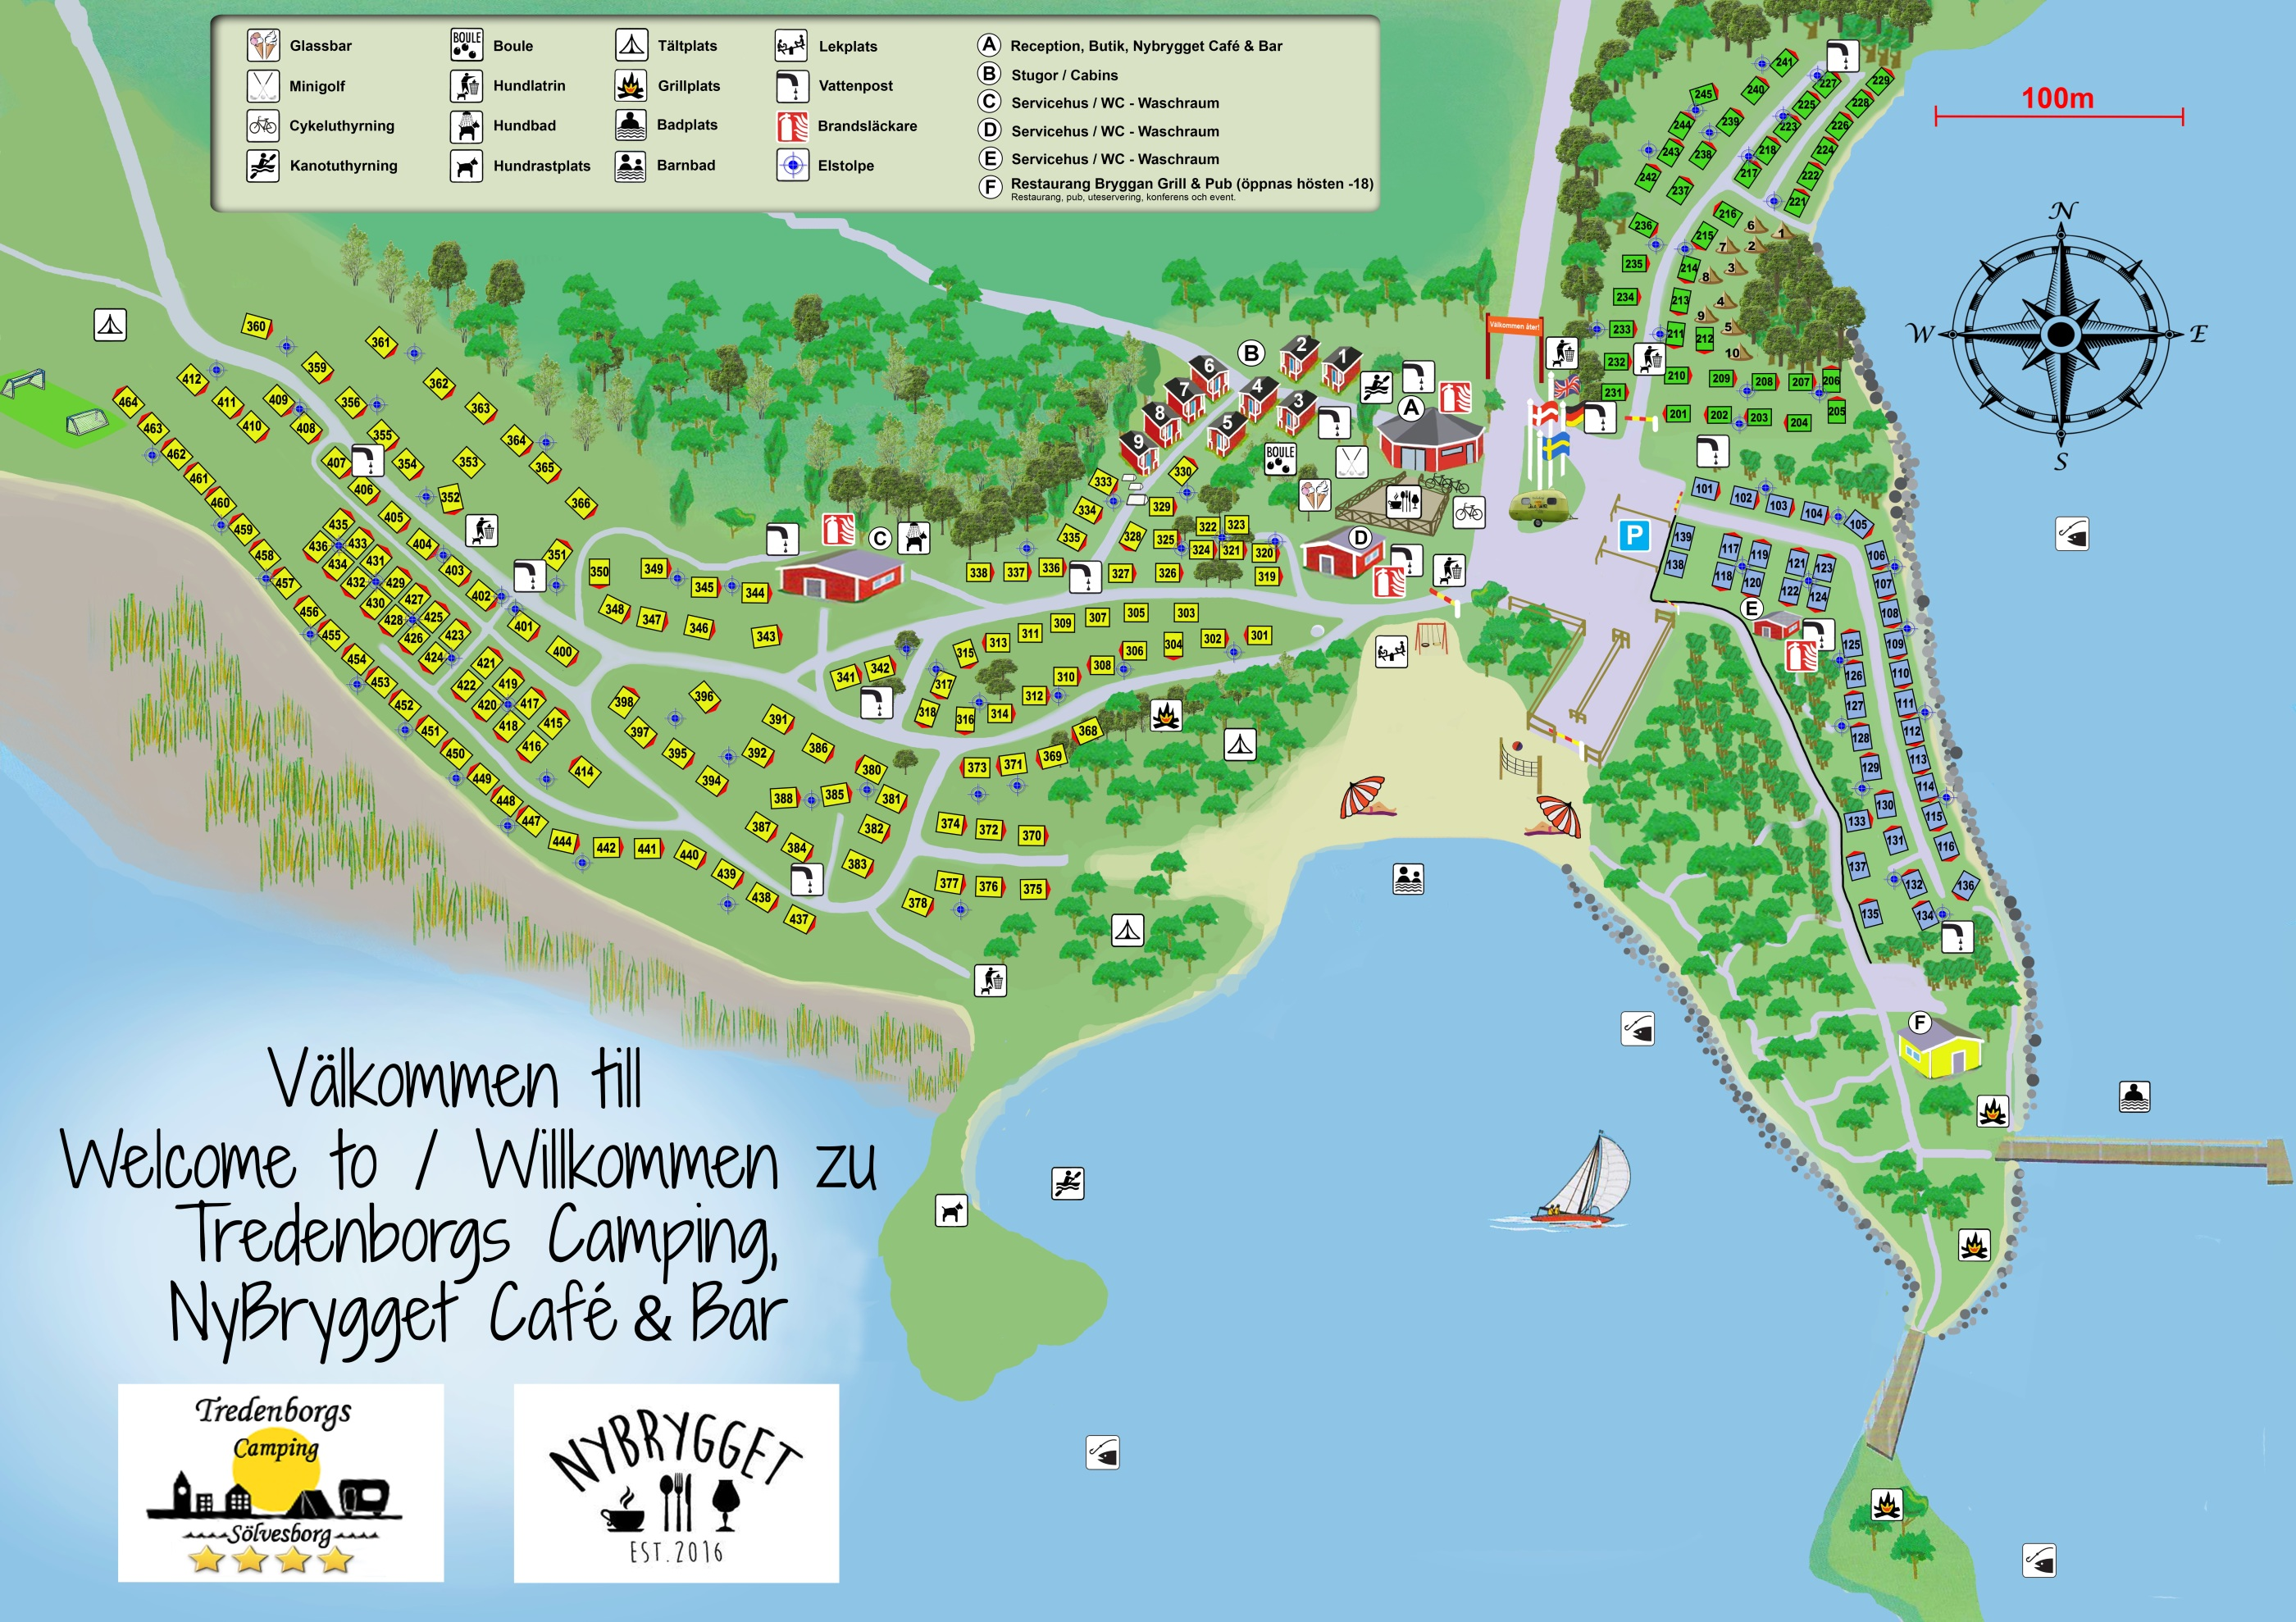 Karta Camping Skane.Karta Tredenborg